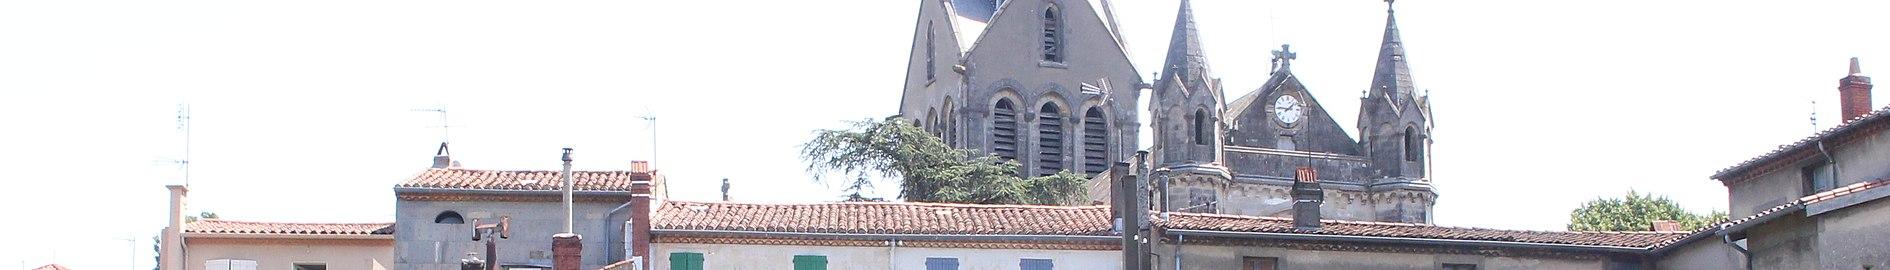 Eglise Notre Dame Mazamet (cropped).jpg